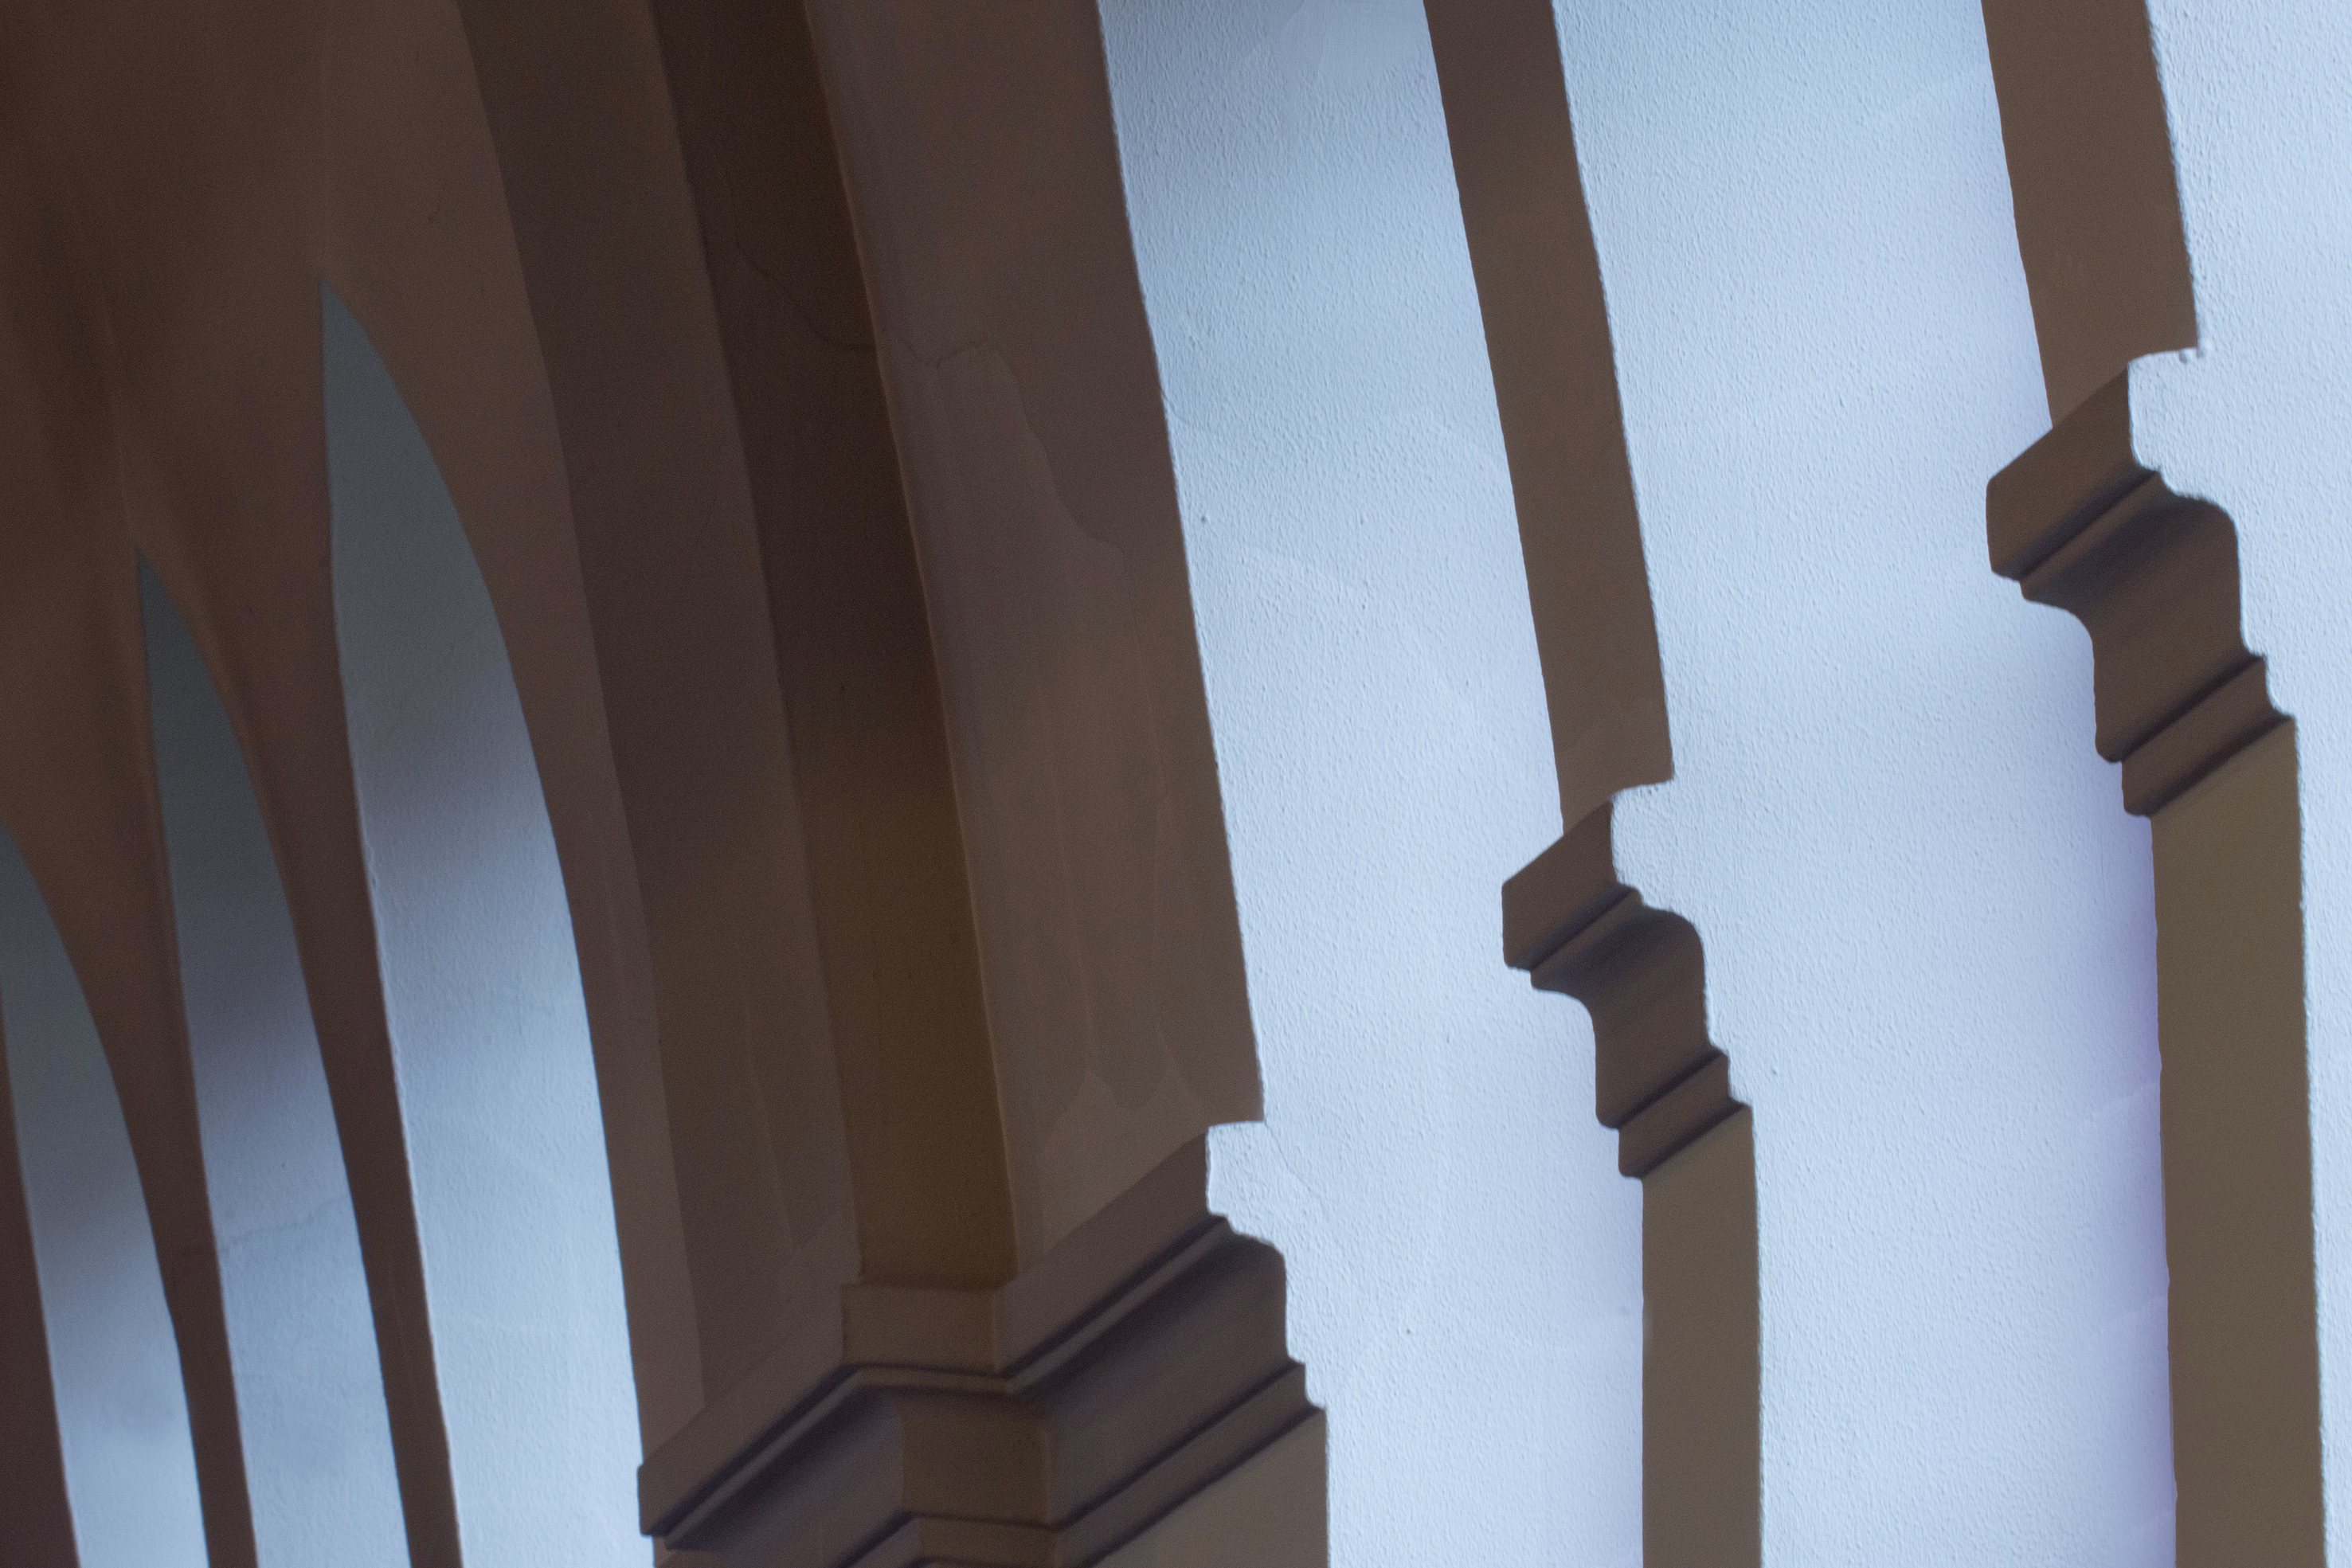 aula Damiaanhuis Alphonsus kapel Mierlo-Hout uitvaart